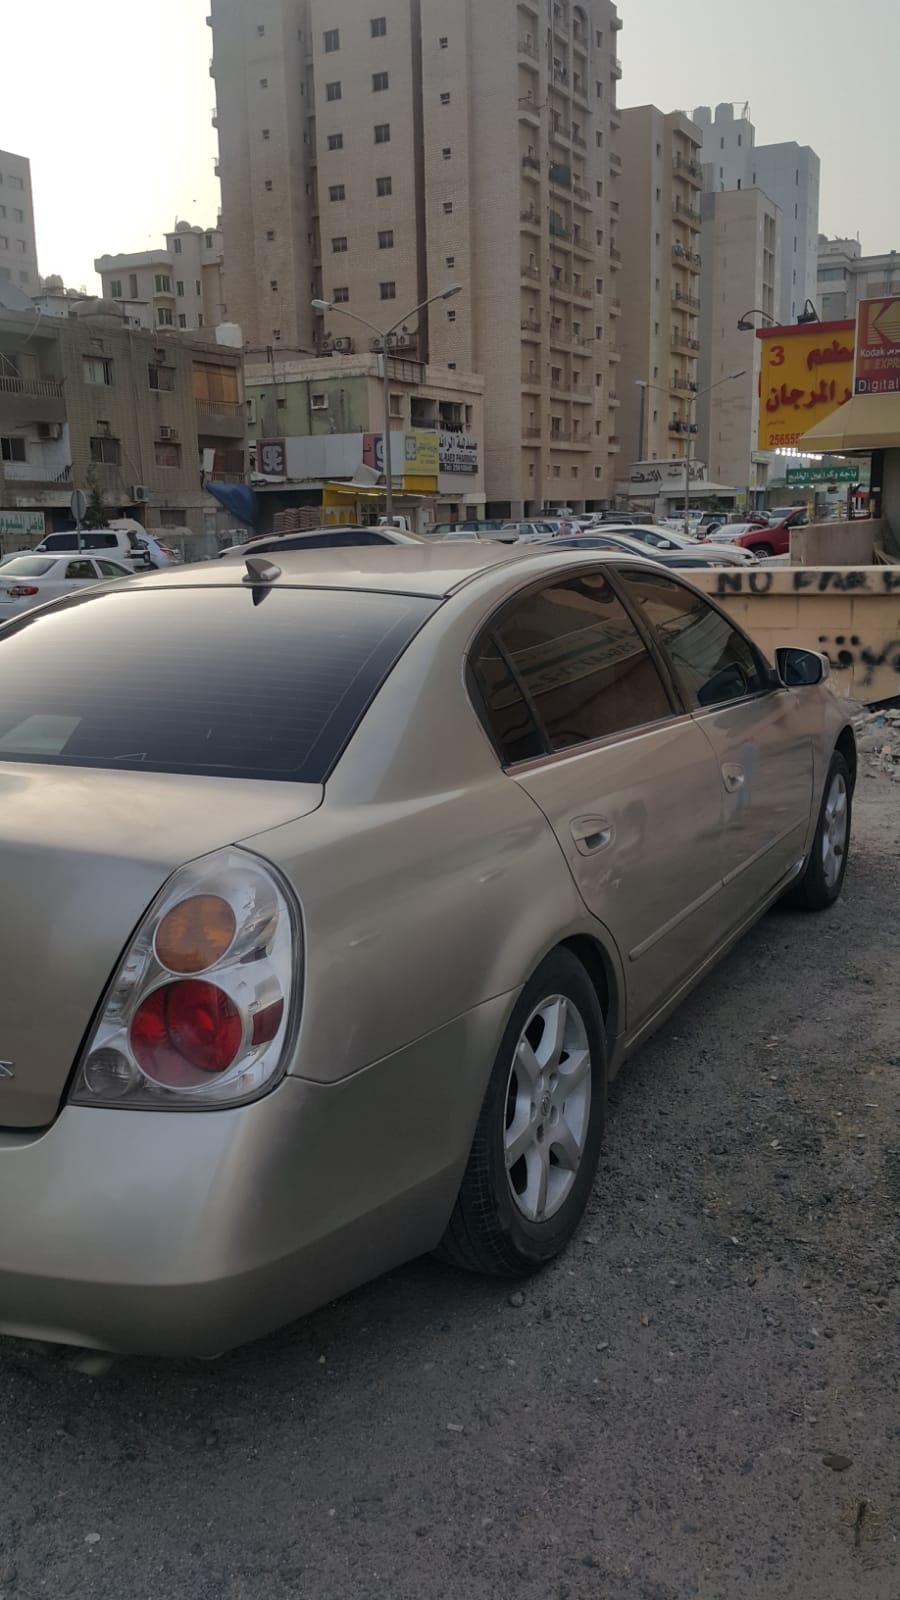 Nissan Altima 2005 forurgent sale